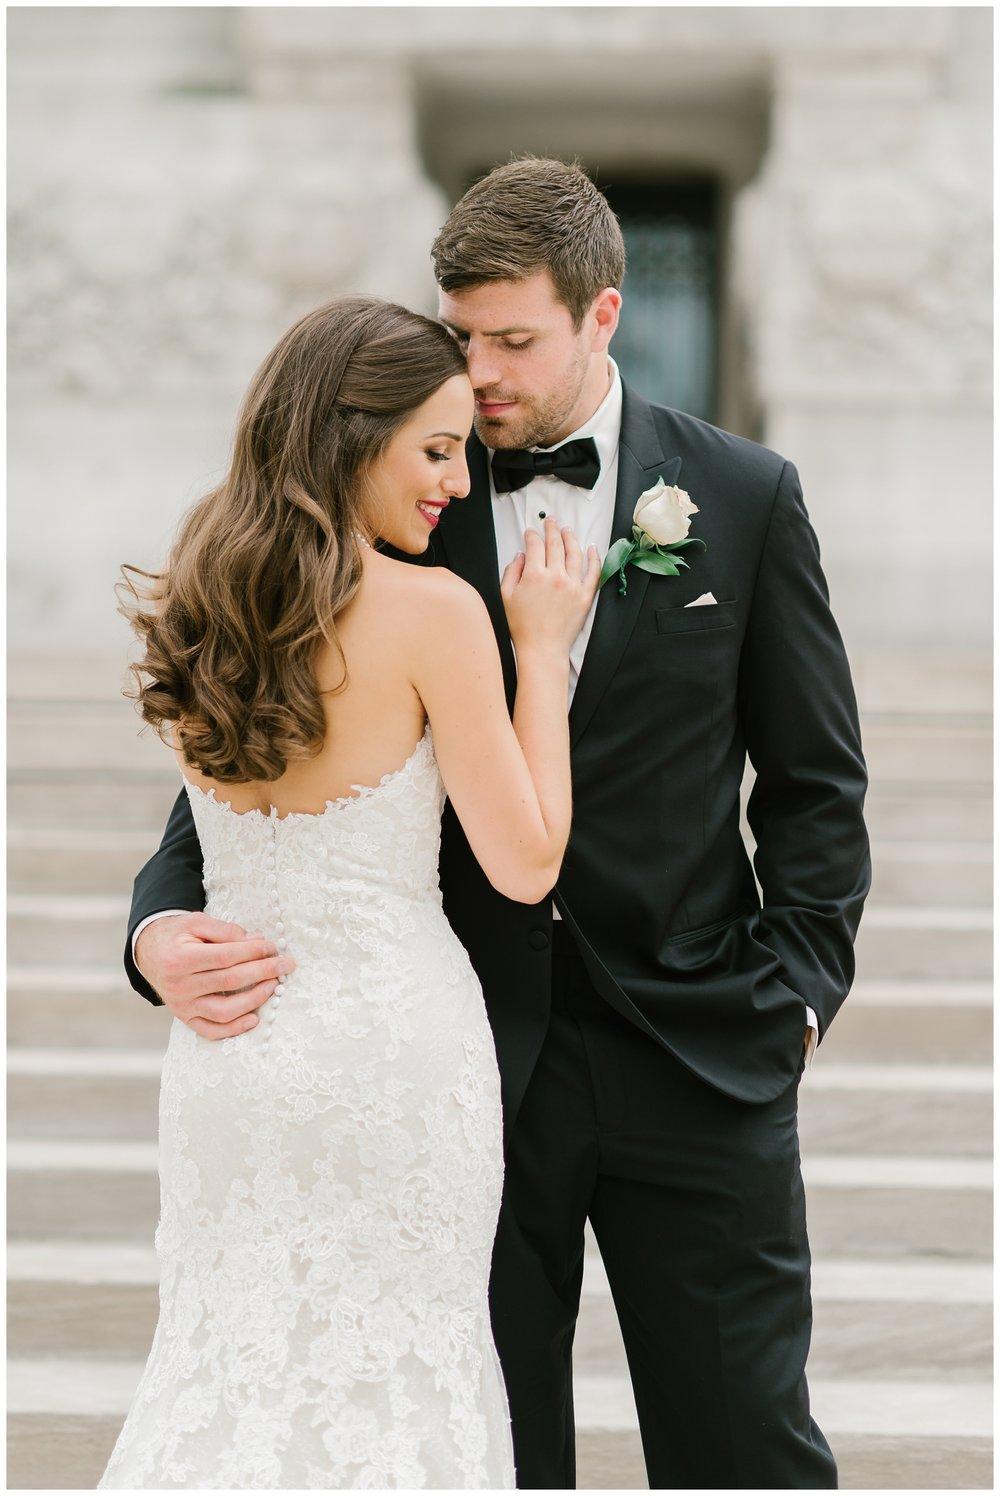 Rebecca_Bridges_Photography_Indianapolis_Wedding_Photographer_6842.jpg